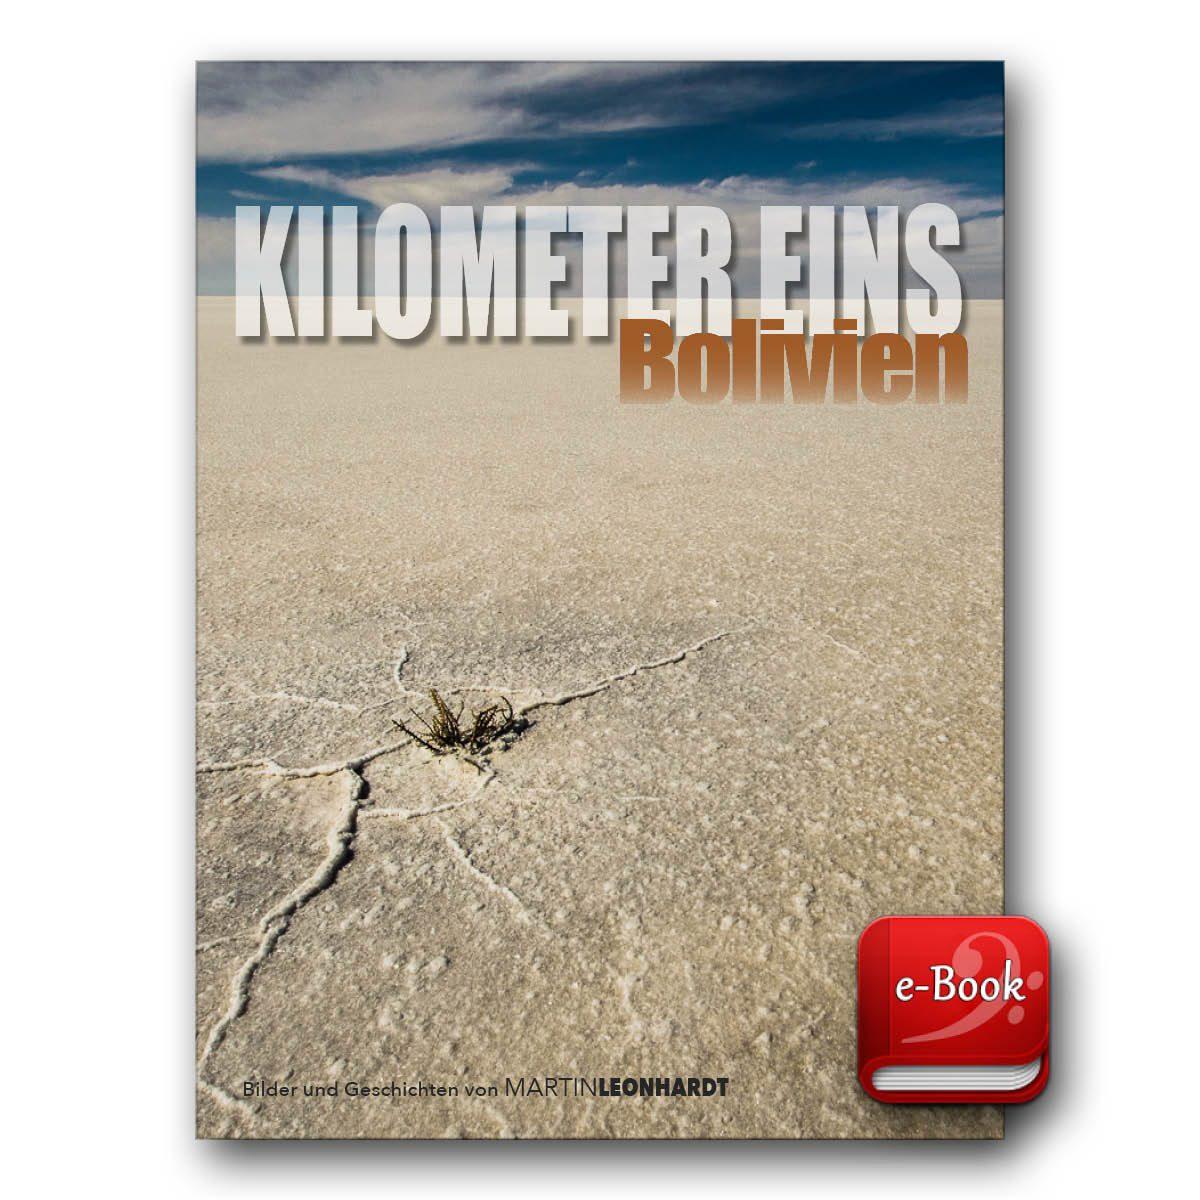 KilometerEins Bolivien Produktlayout